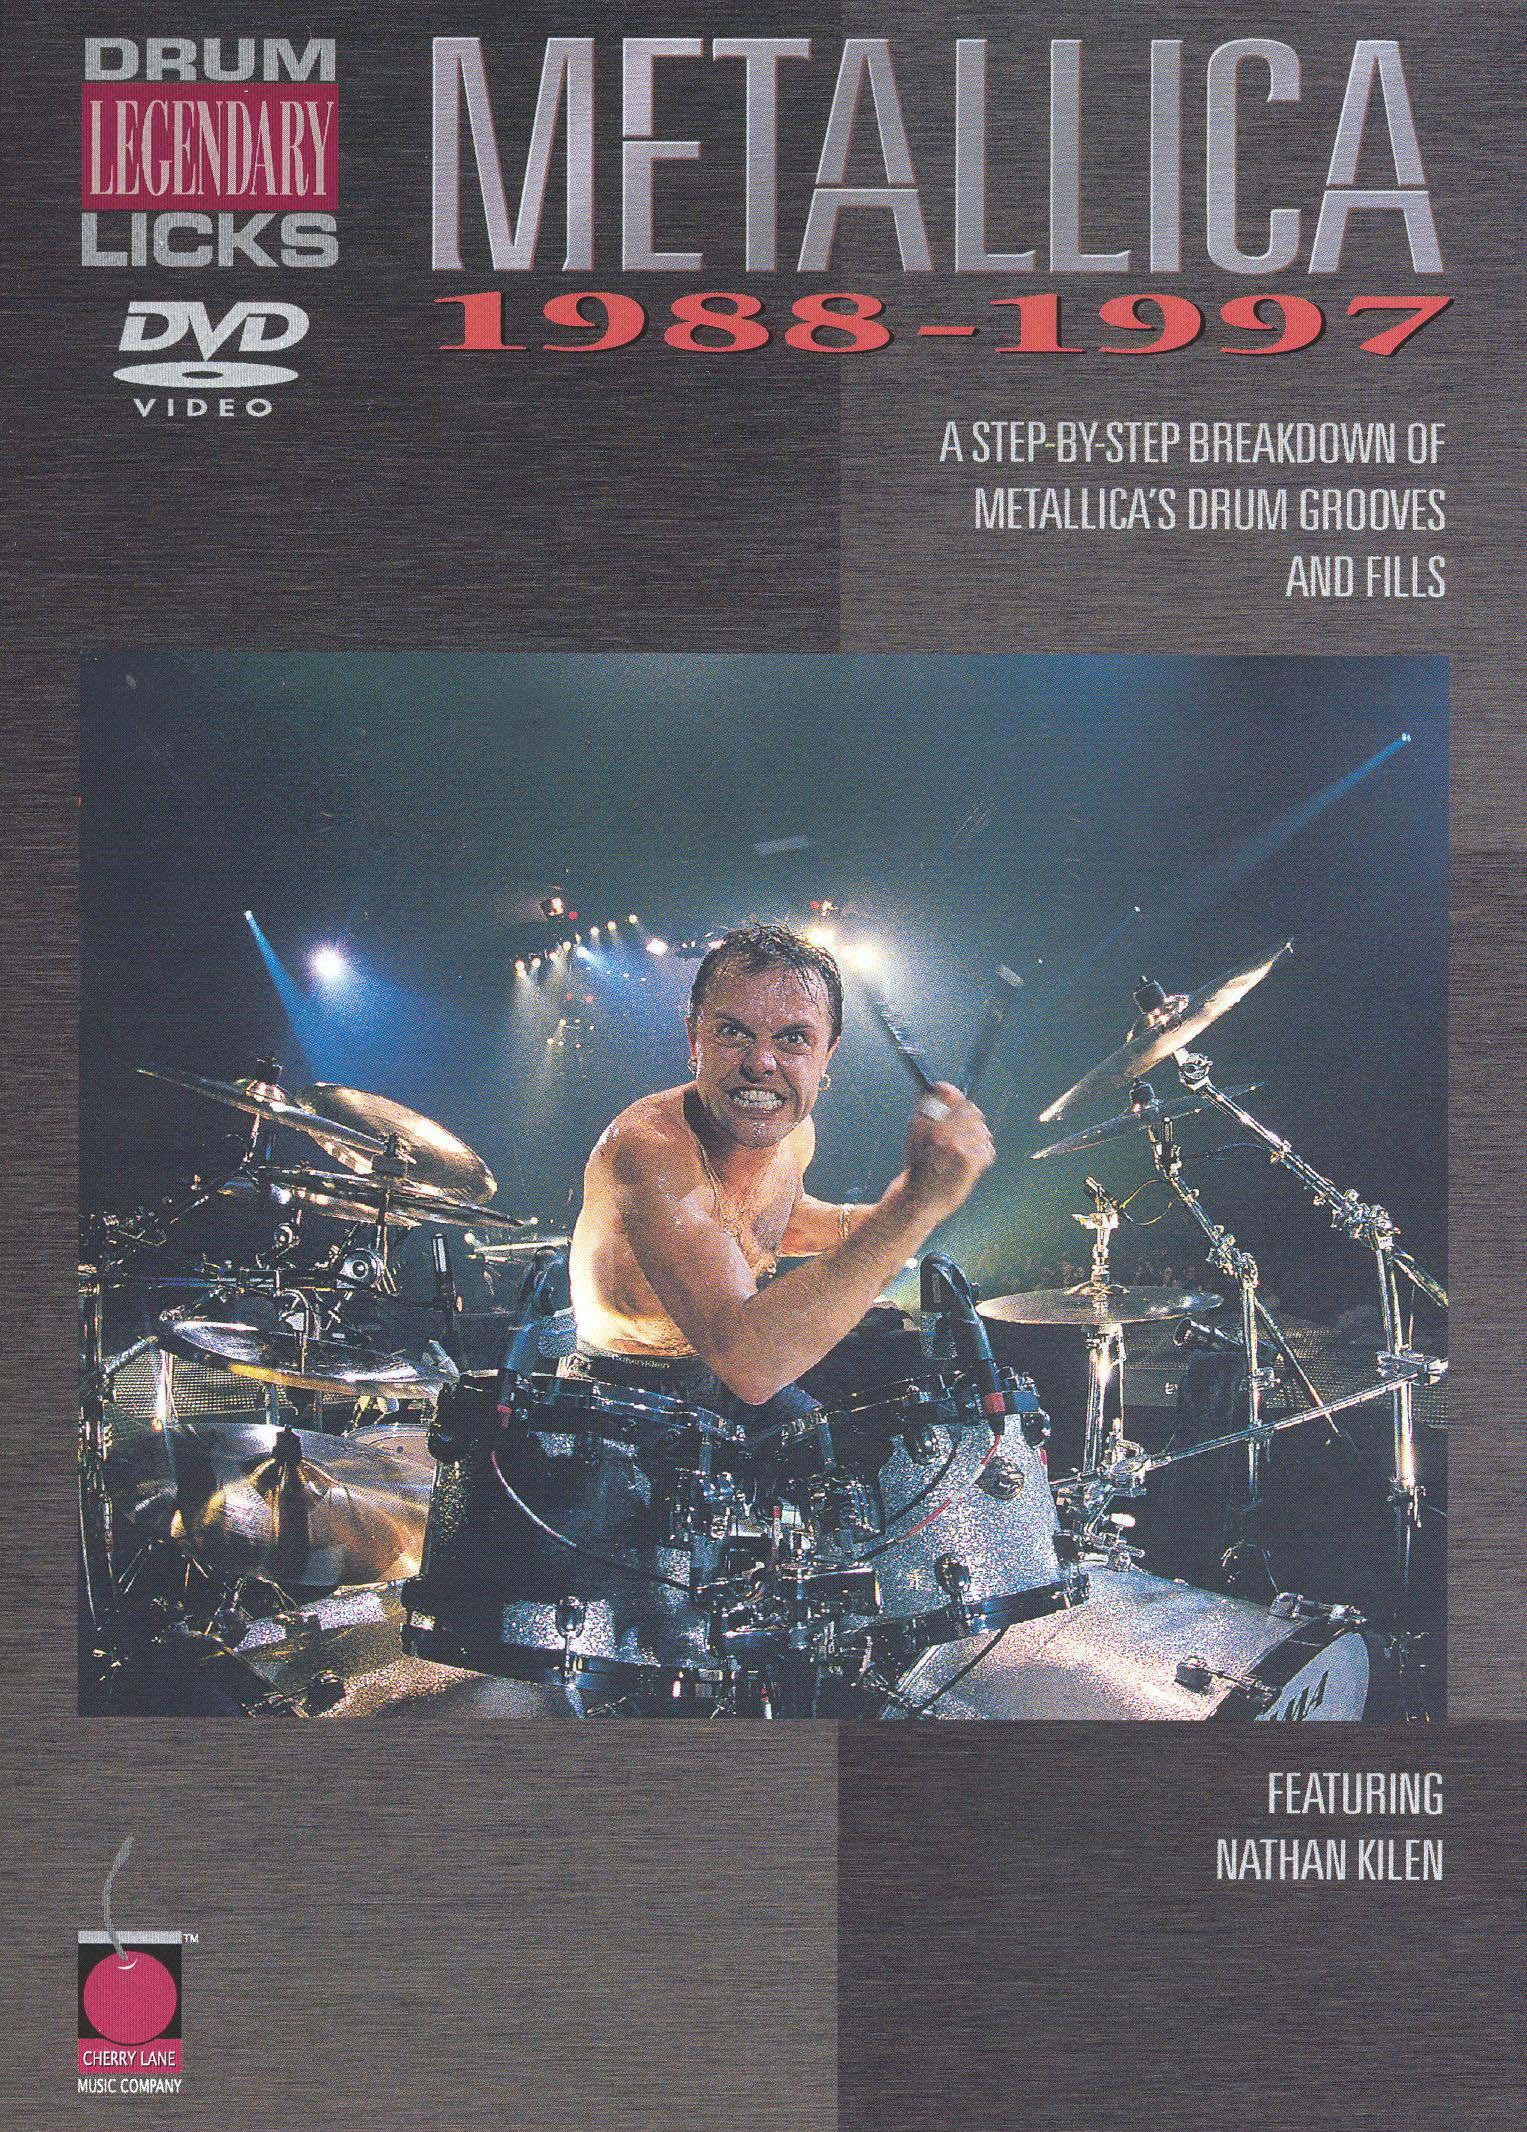 Metallica: Legendary Licks - Drum, 1988-1997